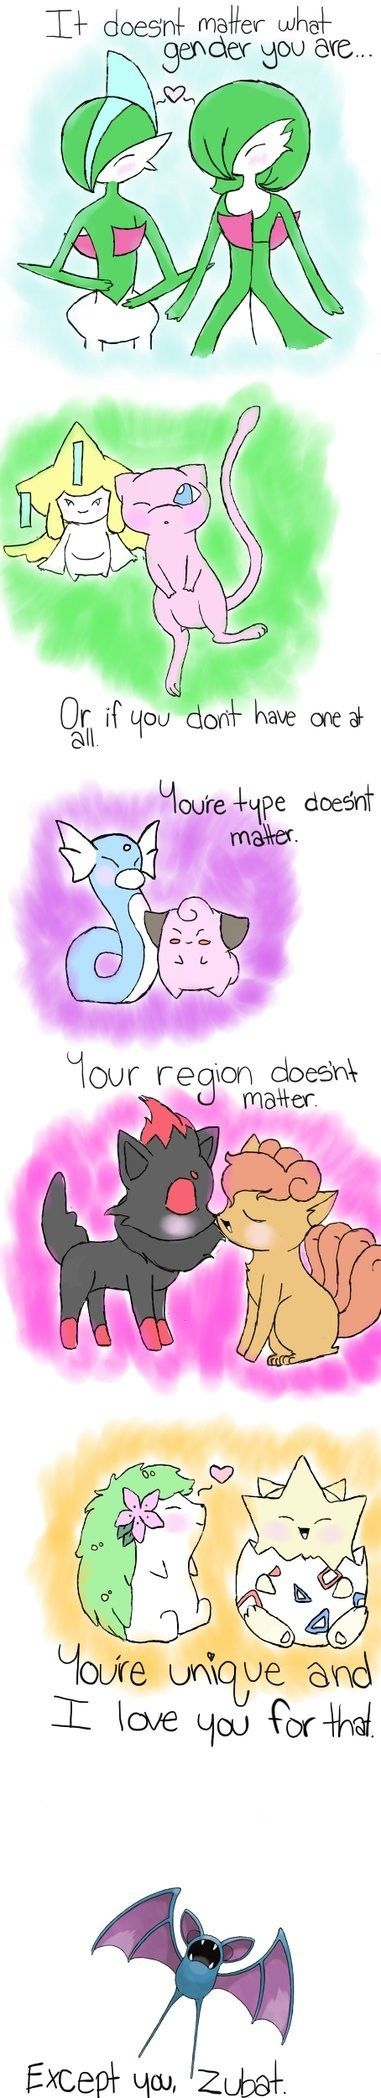 #Pokemon love...except you... via Reddit user Aedora125